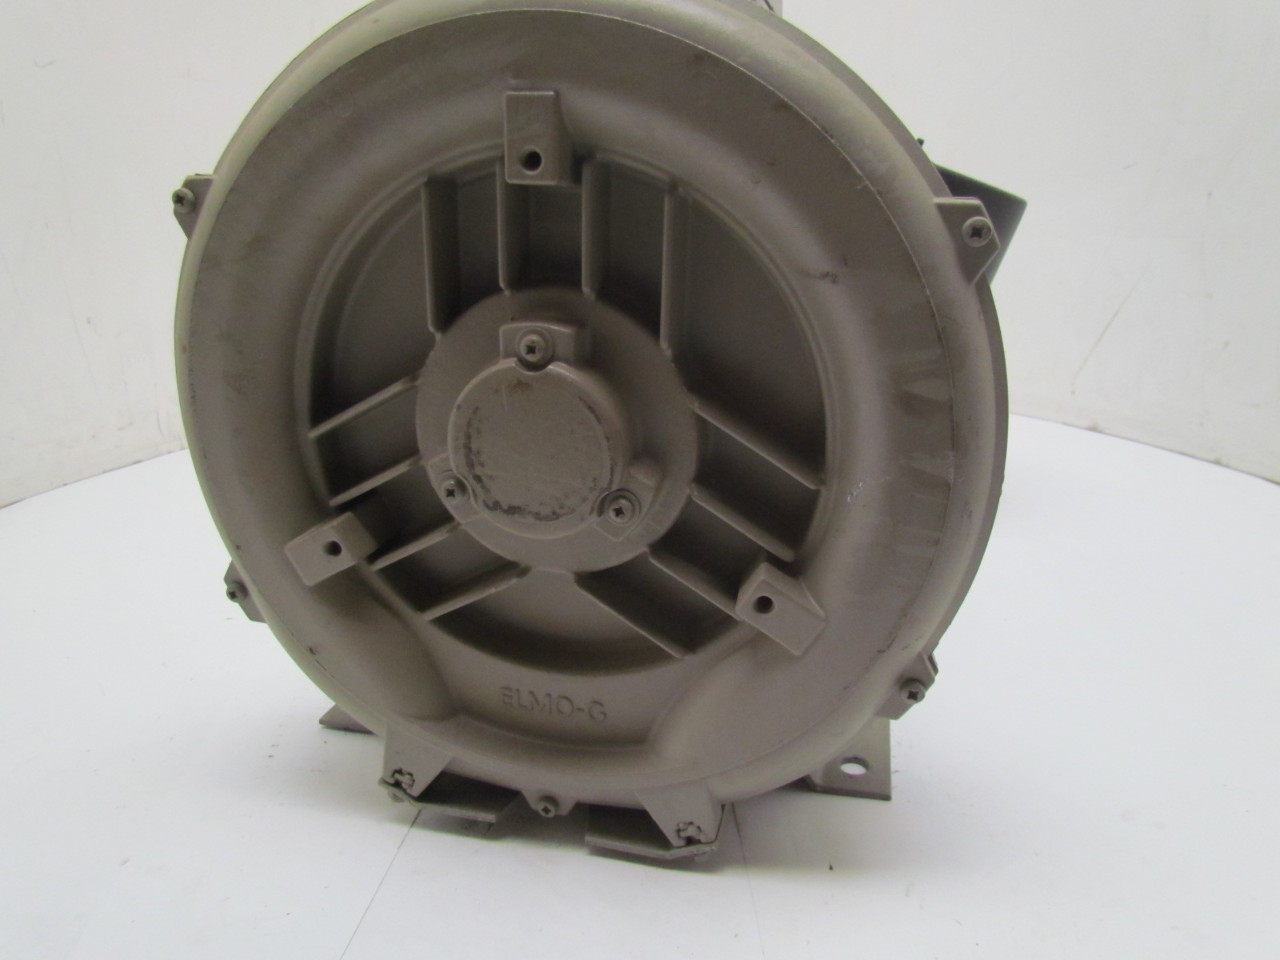 Siemens Gas Ring Vacuum Compressor Single Stage W Pressure